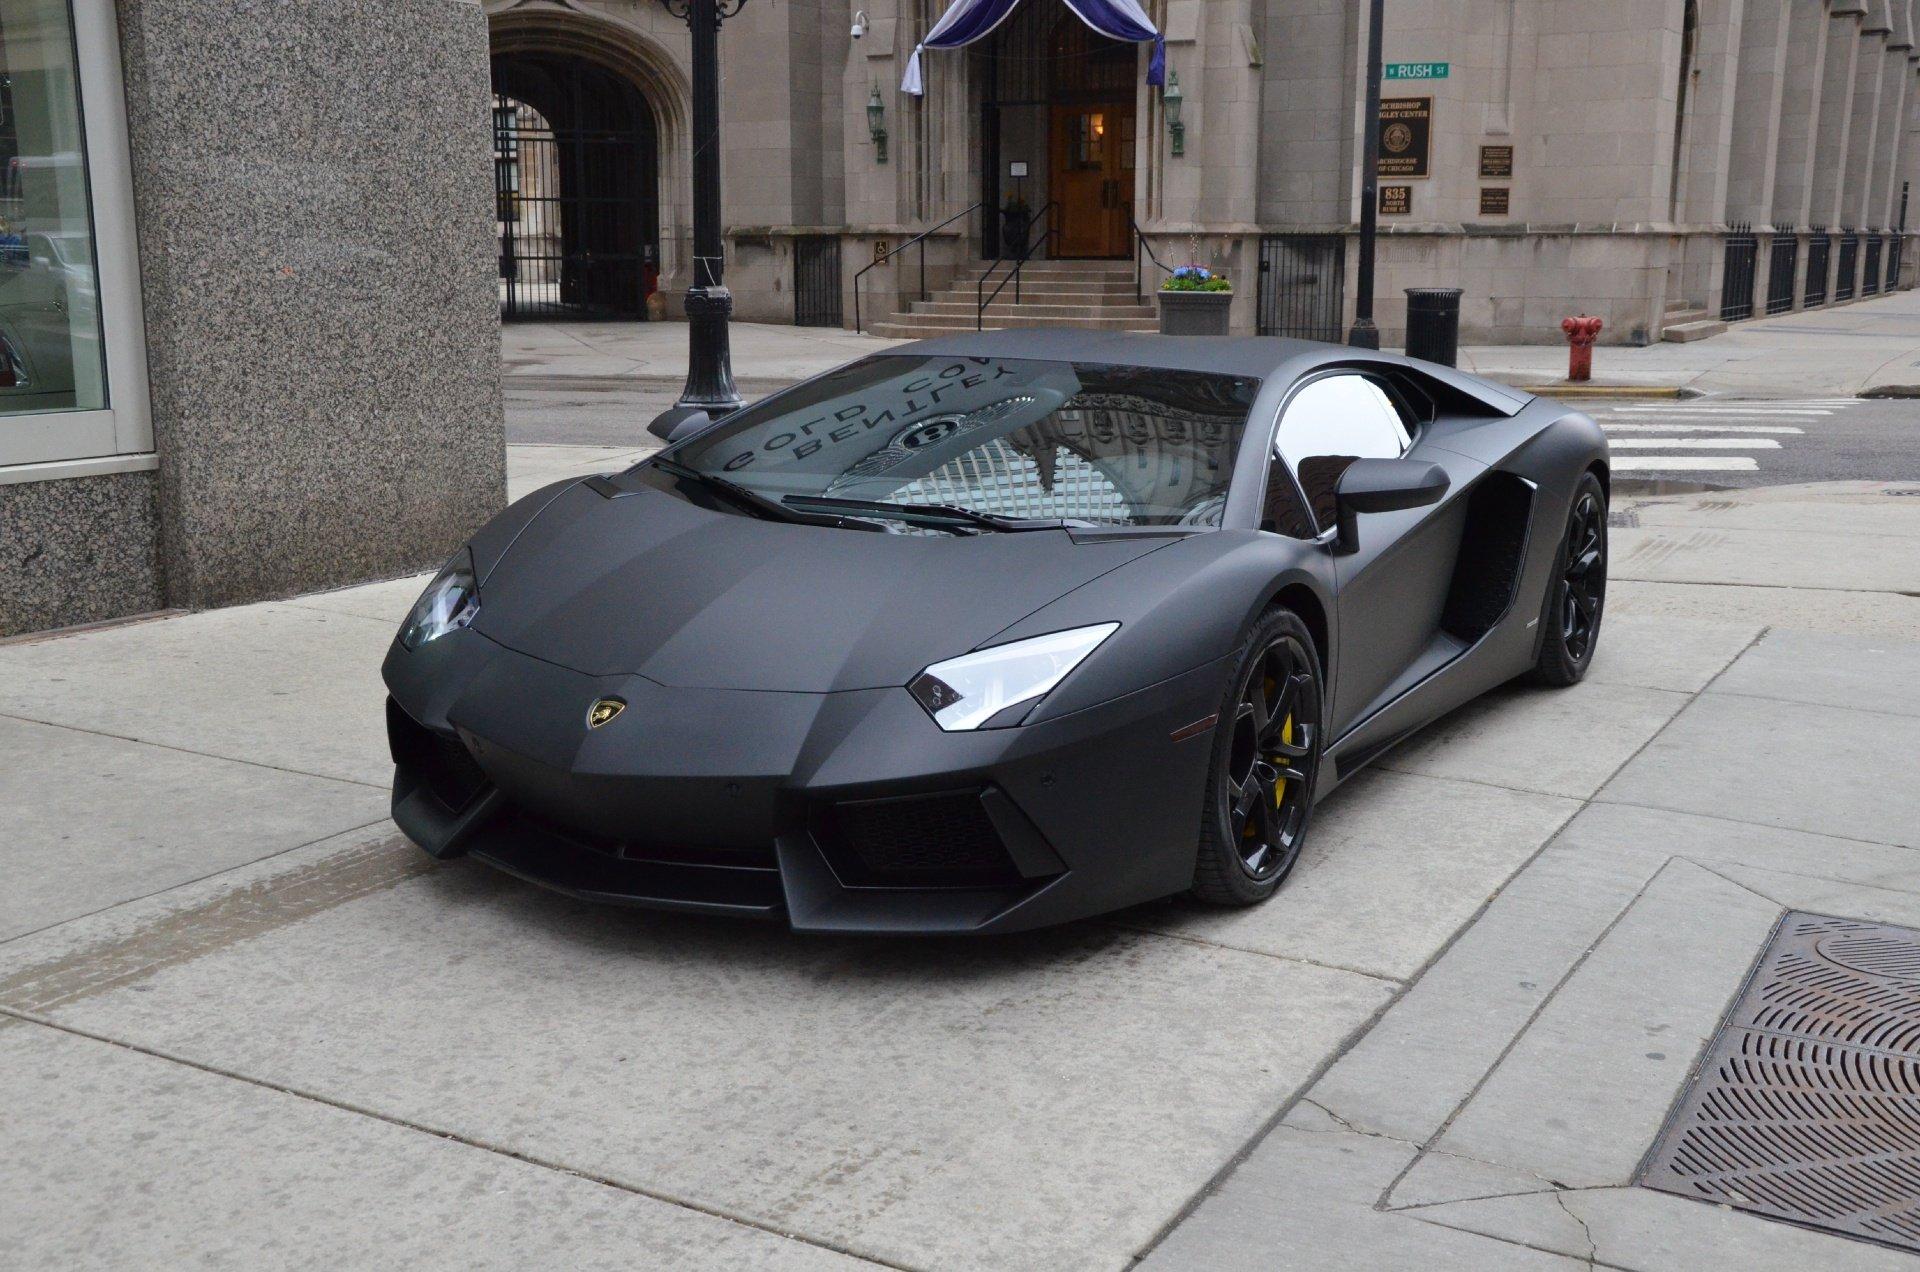 2012 lamborghini aventador coupe cars nero pegaso black matt wallpaper 1920x1272 759815 wallpaperup - Lamborghini Aventador 2015 Black